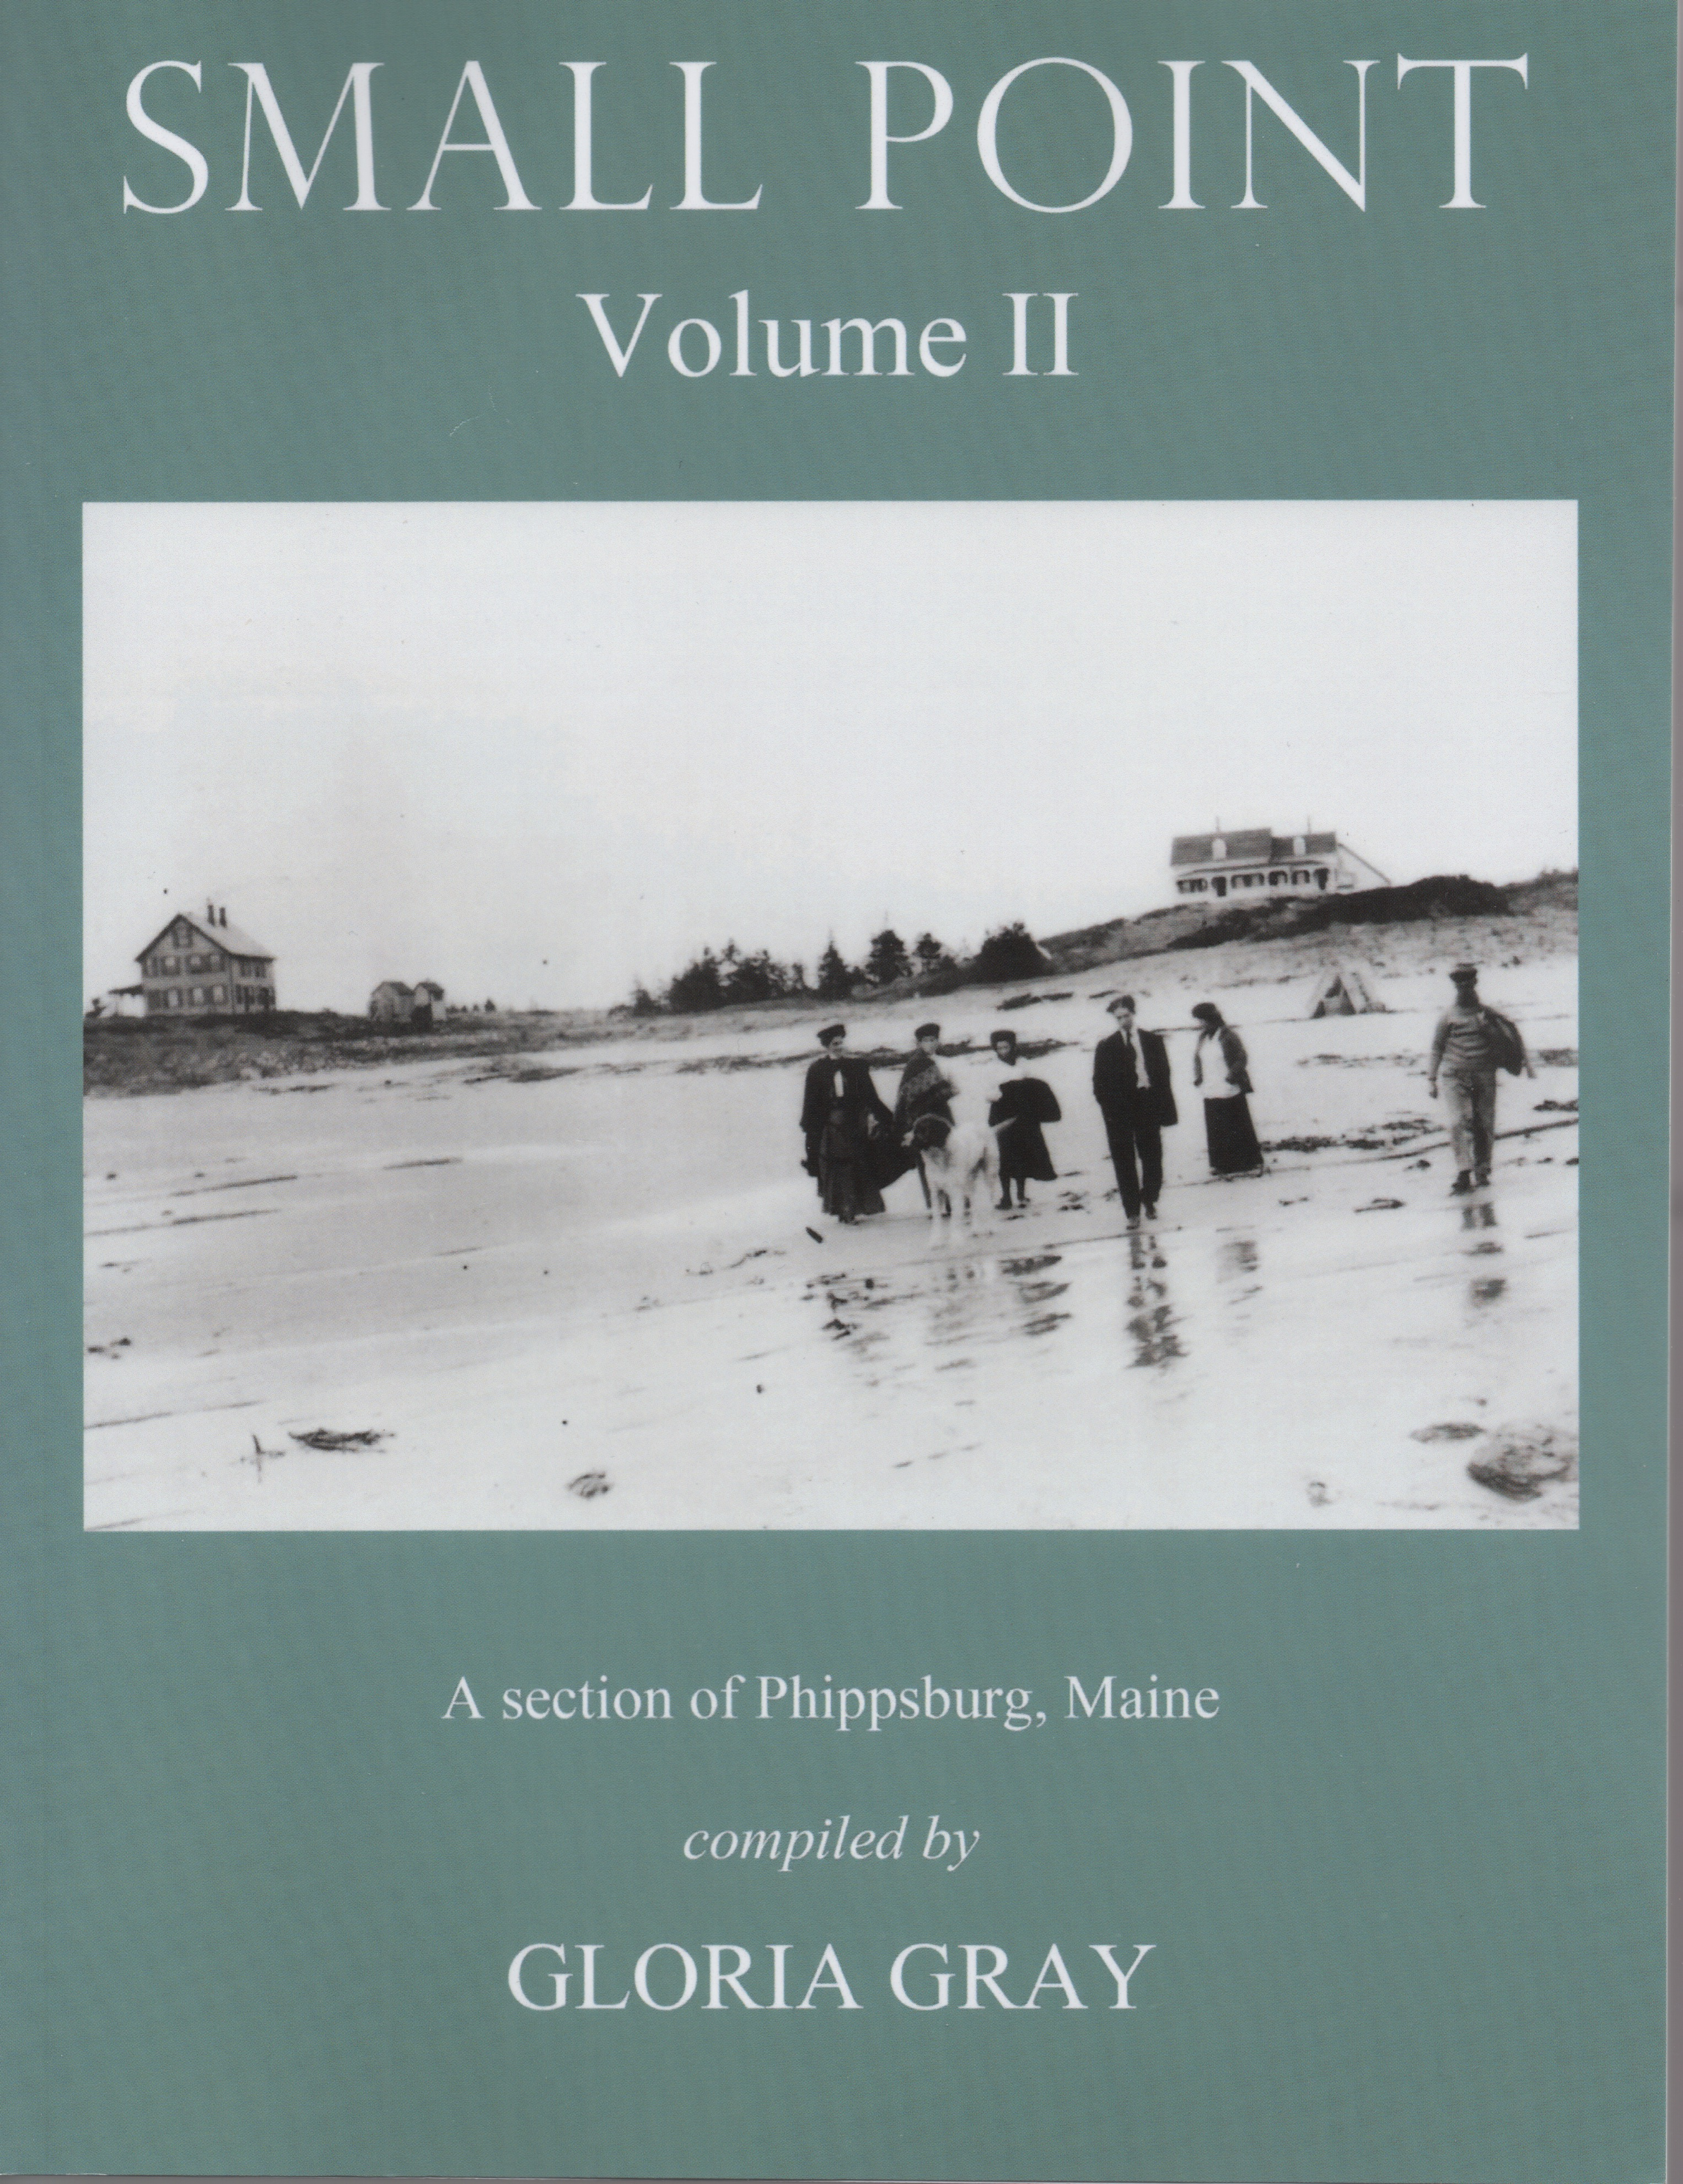 Small Point Volume II